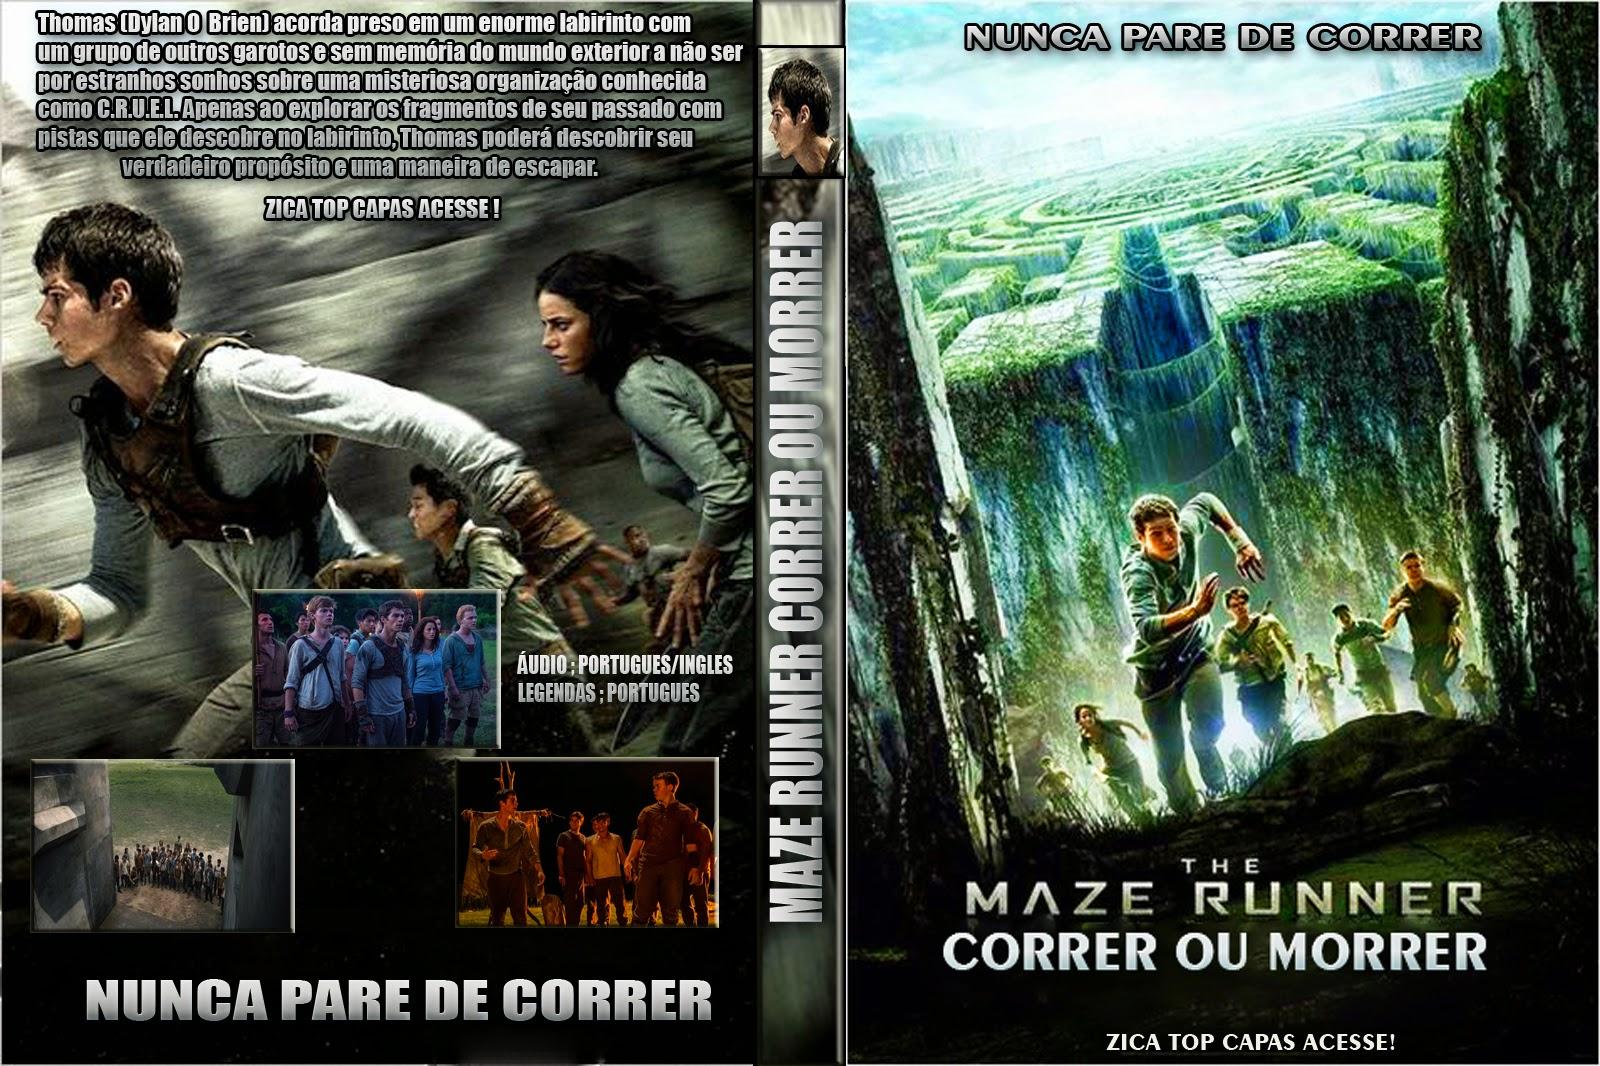 Capa do filme maze runner correr ou morrer